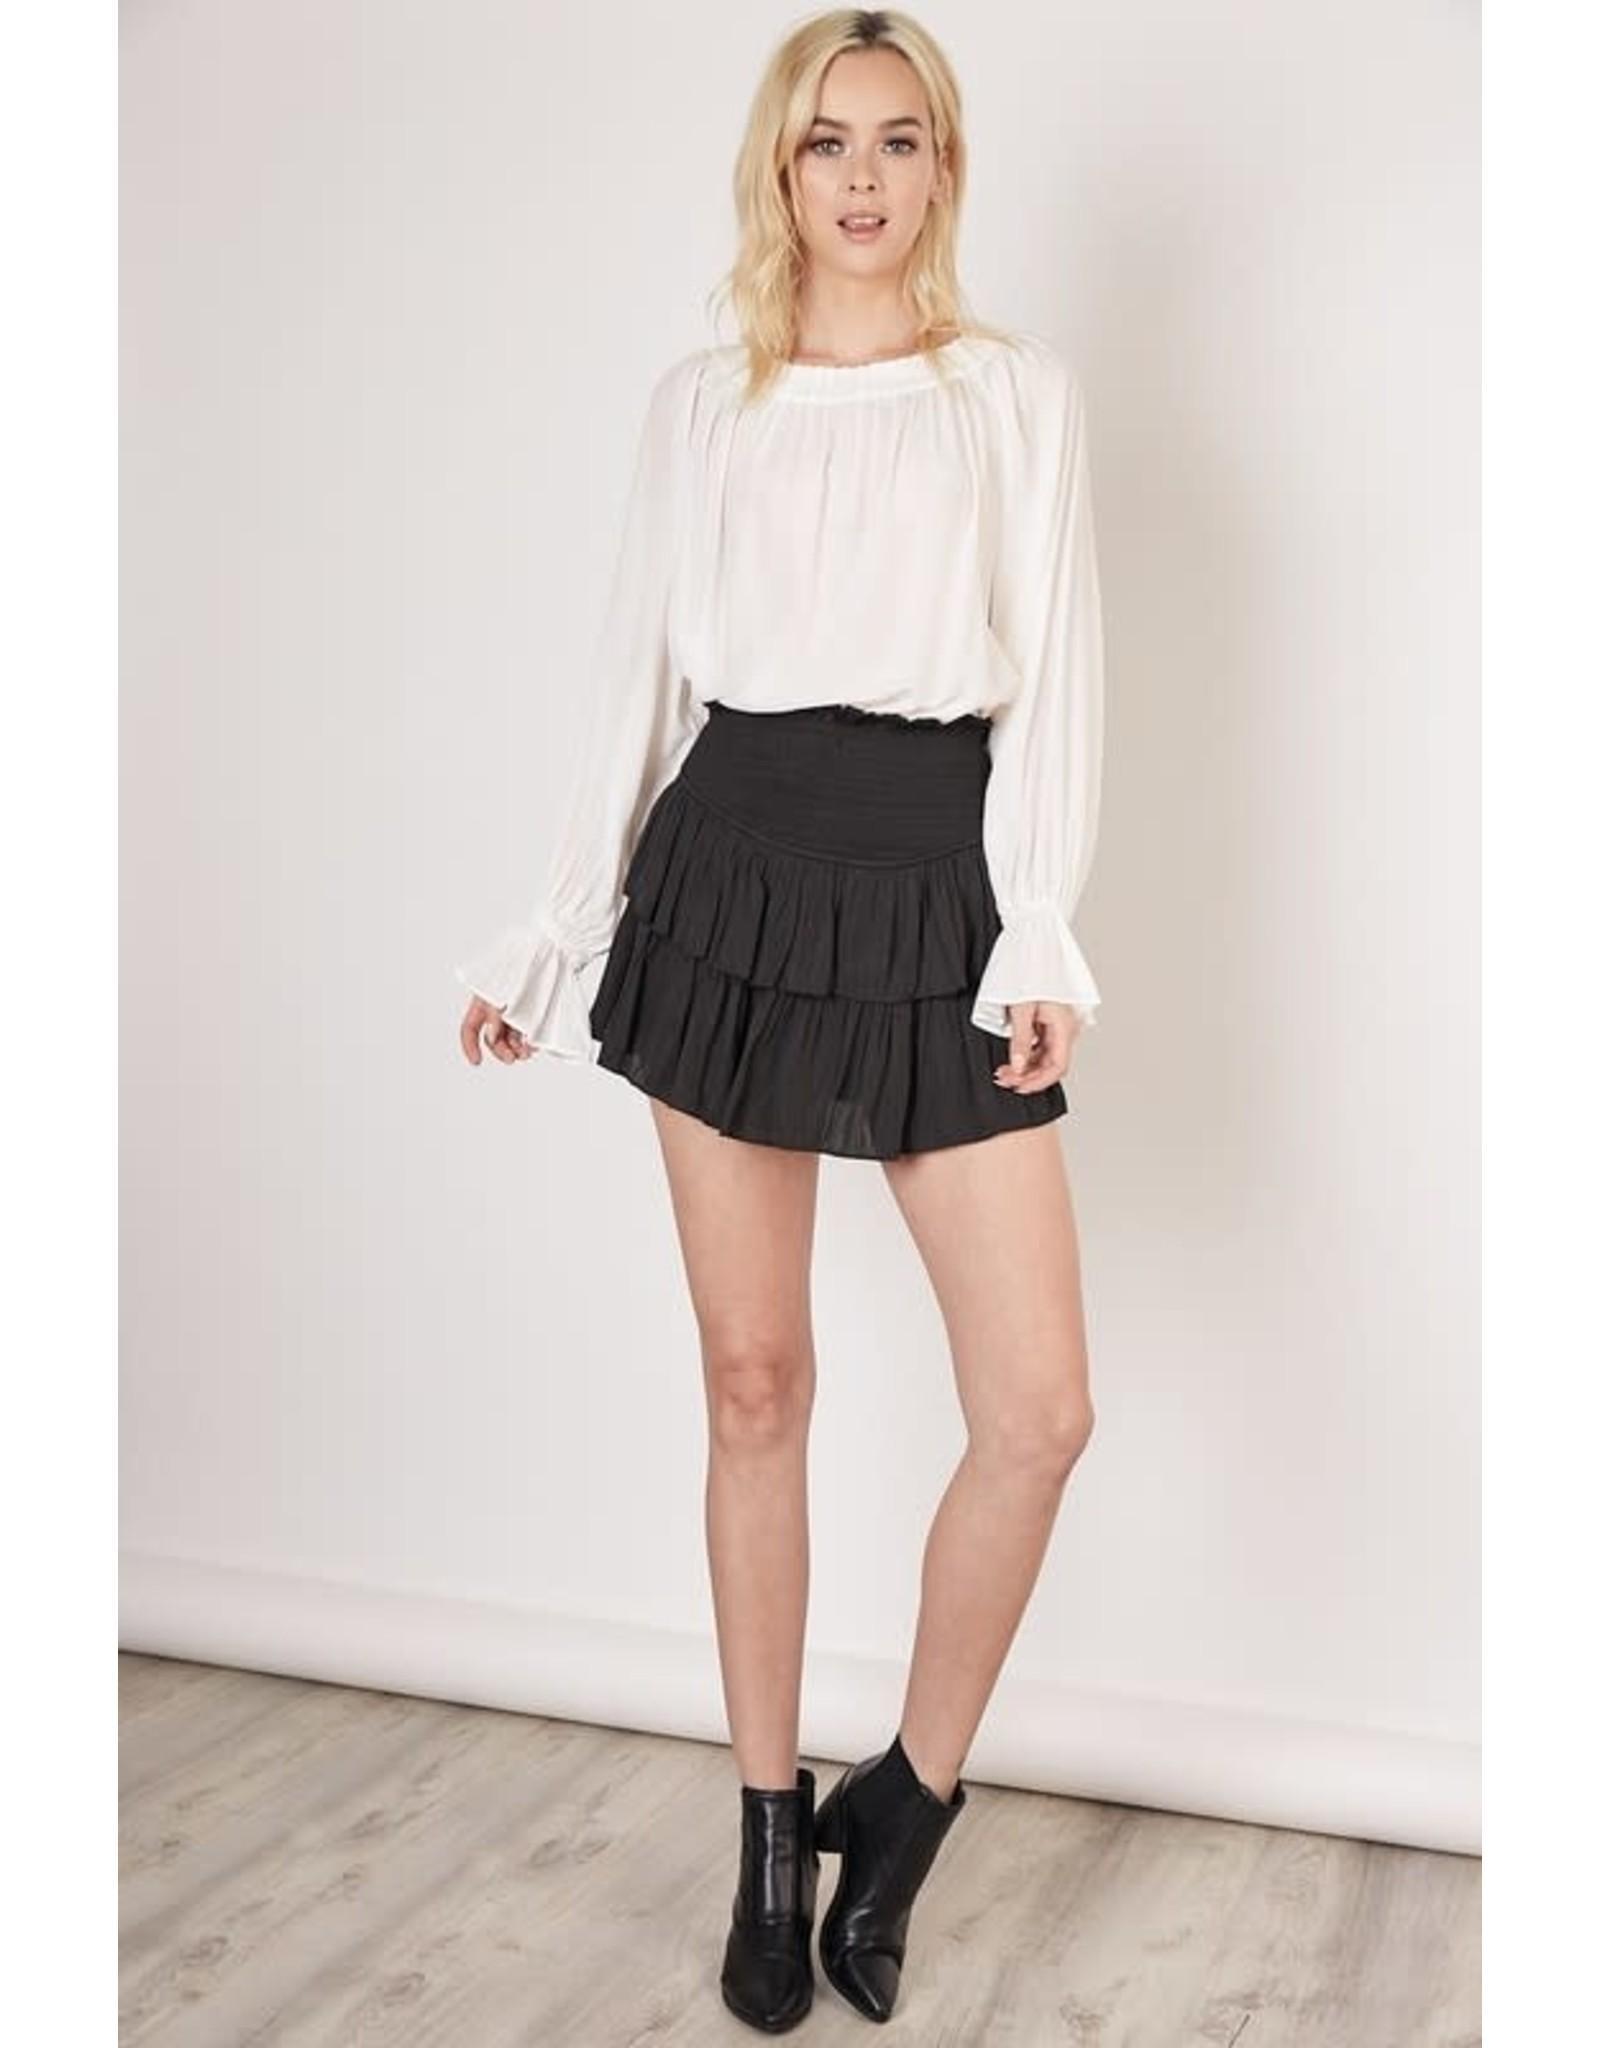 Hello Fall Skirt